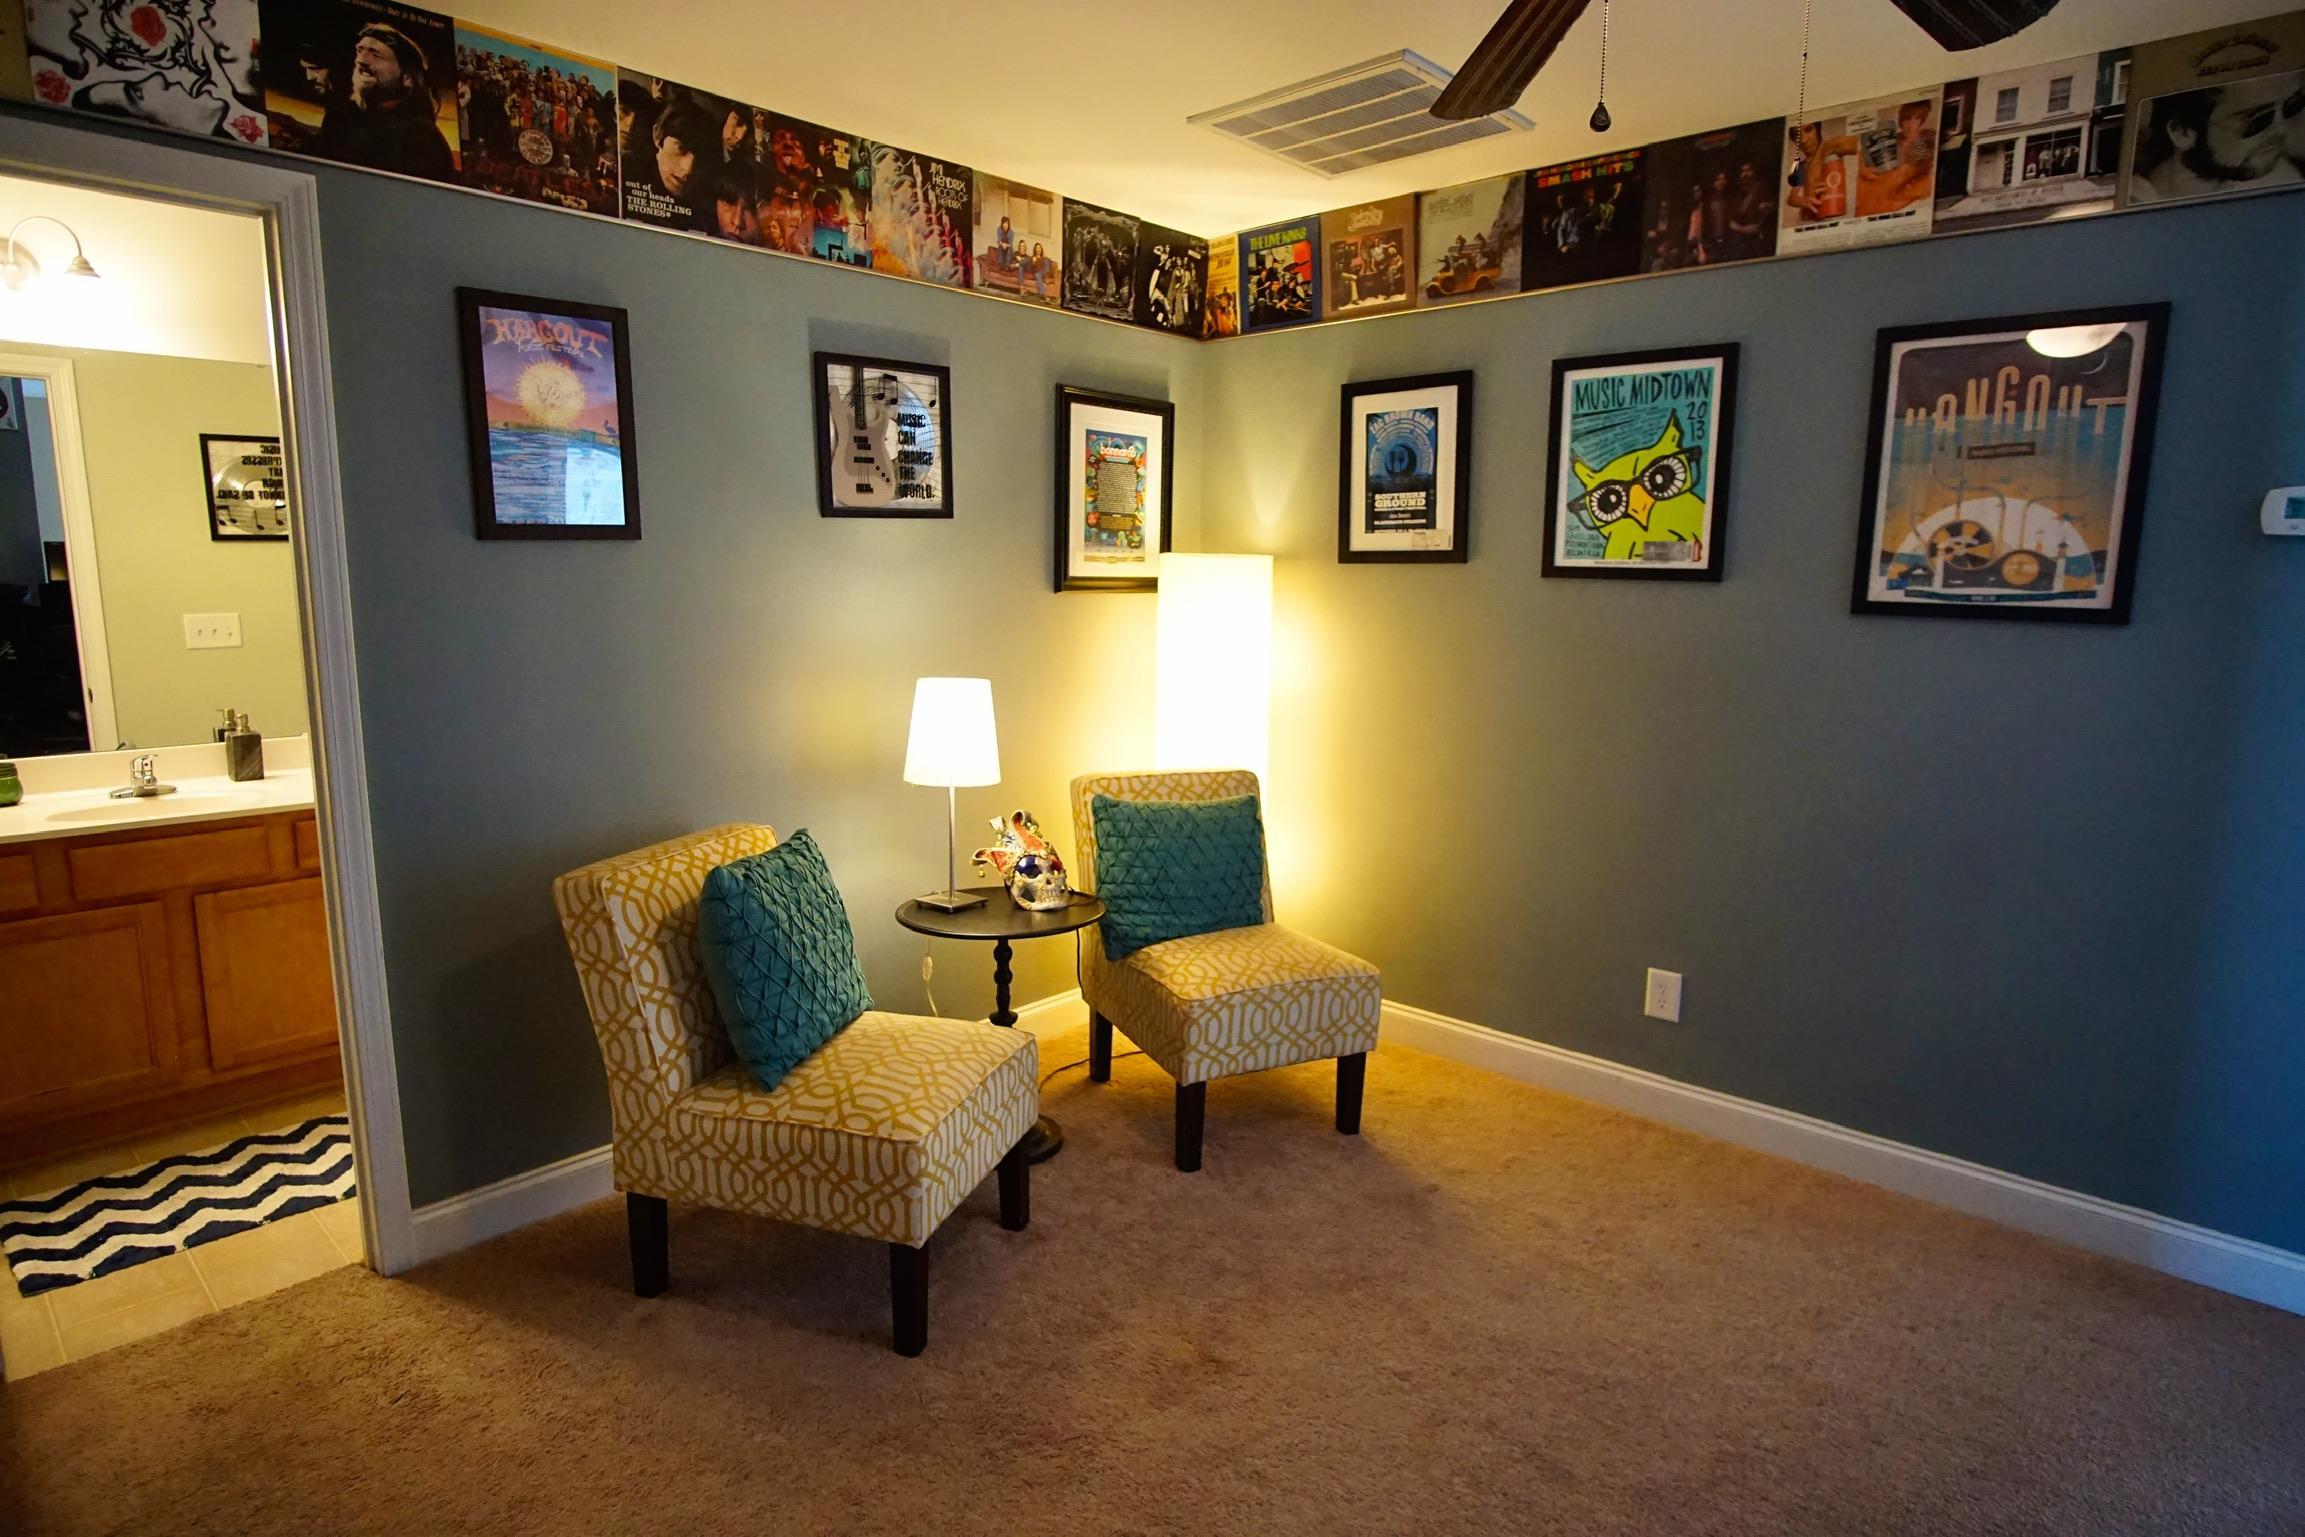 Colony North II Homes For Sale - 7828 Magellan, North Charleston, SC - 20